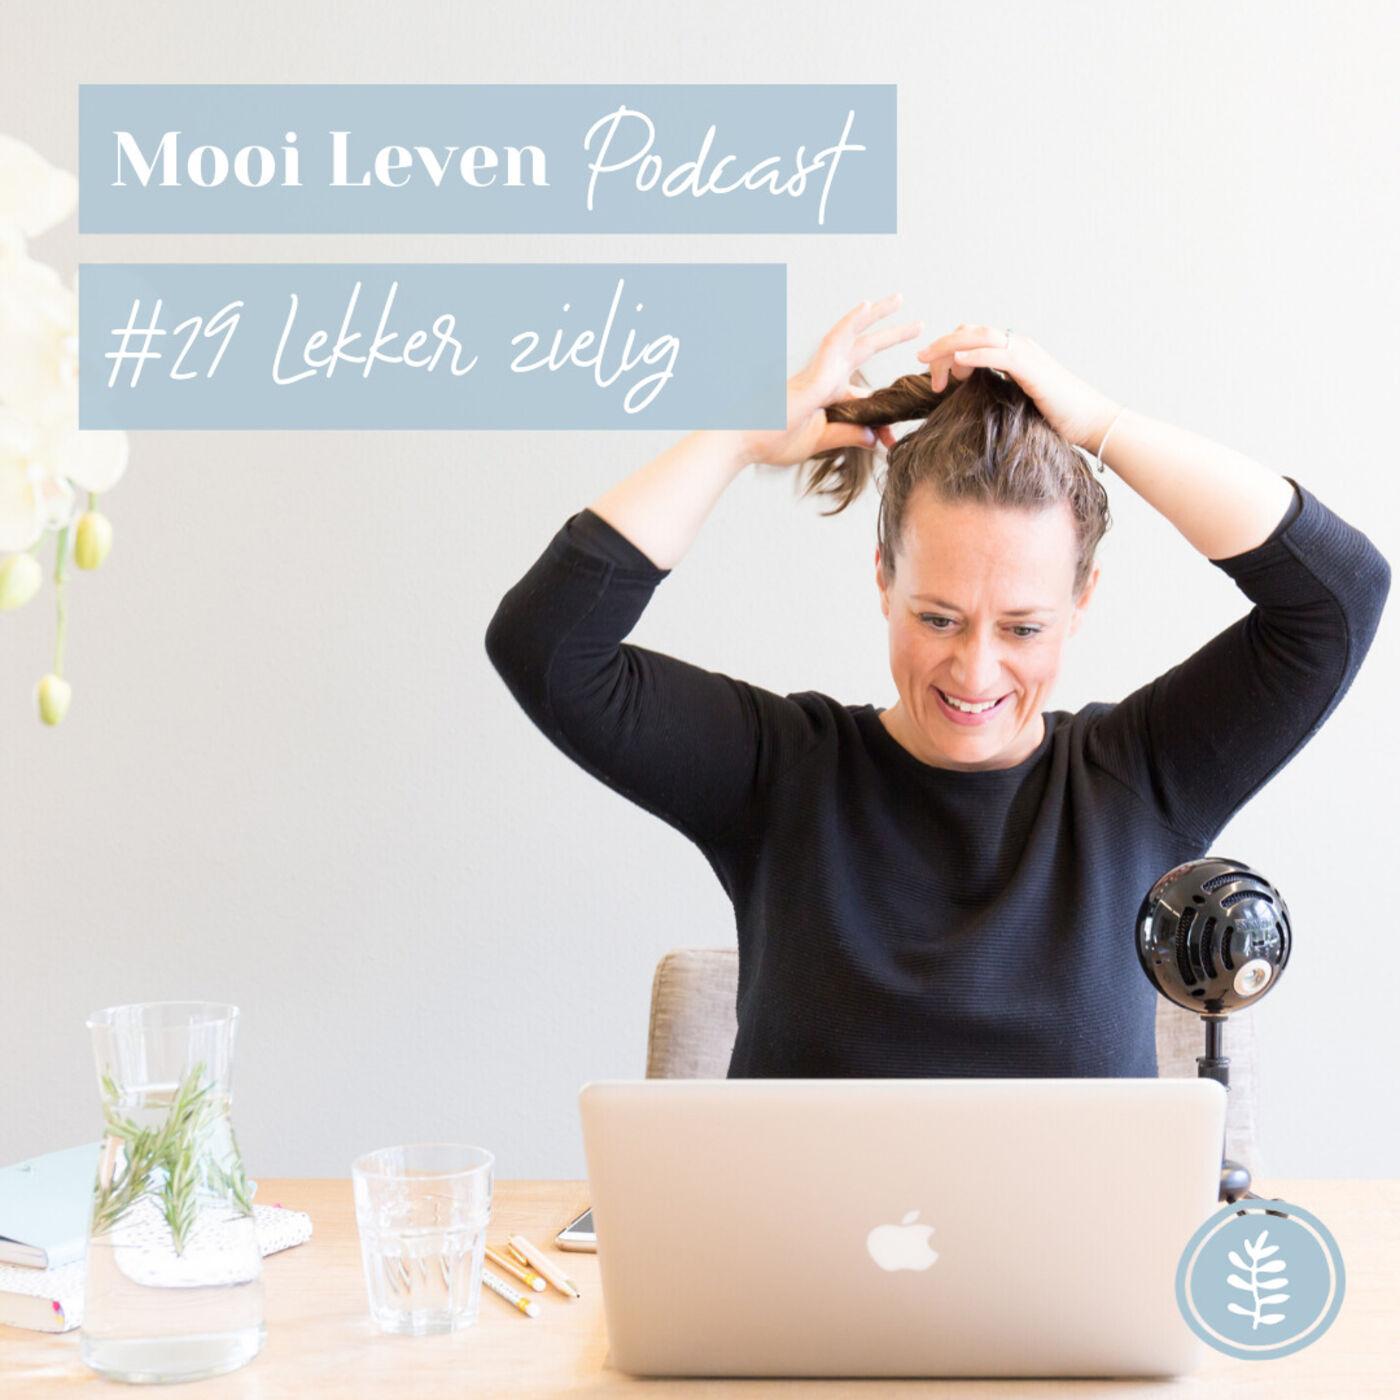 Mooi Leven Podcast #29 | Lekker zielig